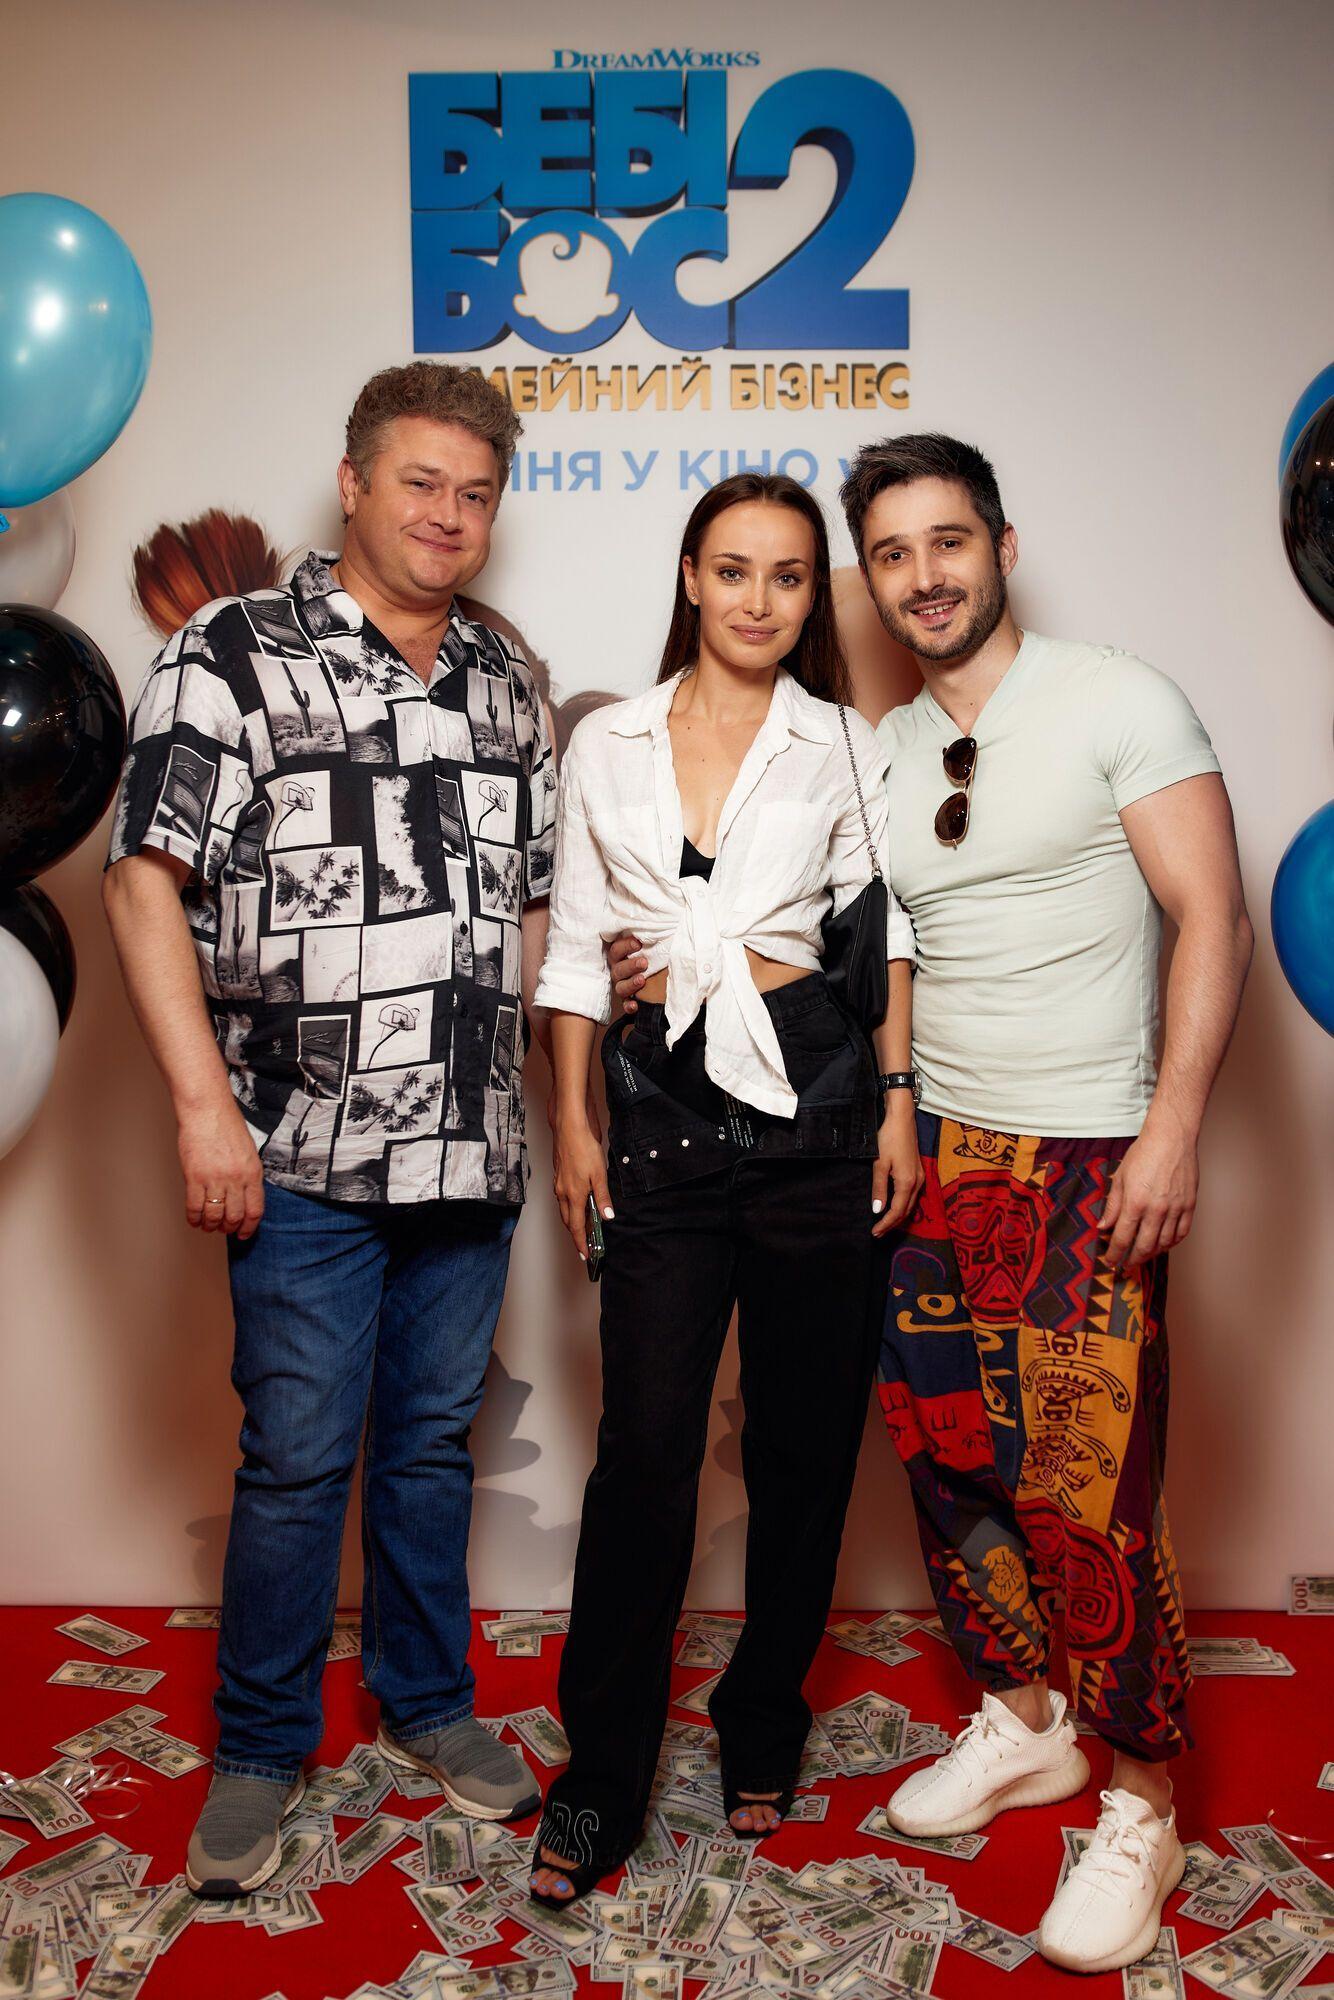 Ксения Мишина, Андрей Фединчик и Назар Заднепровский